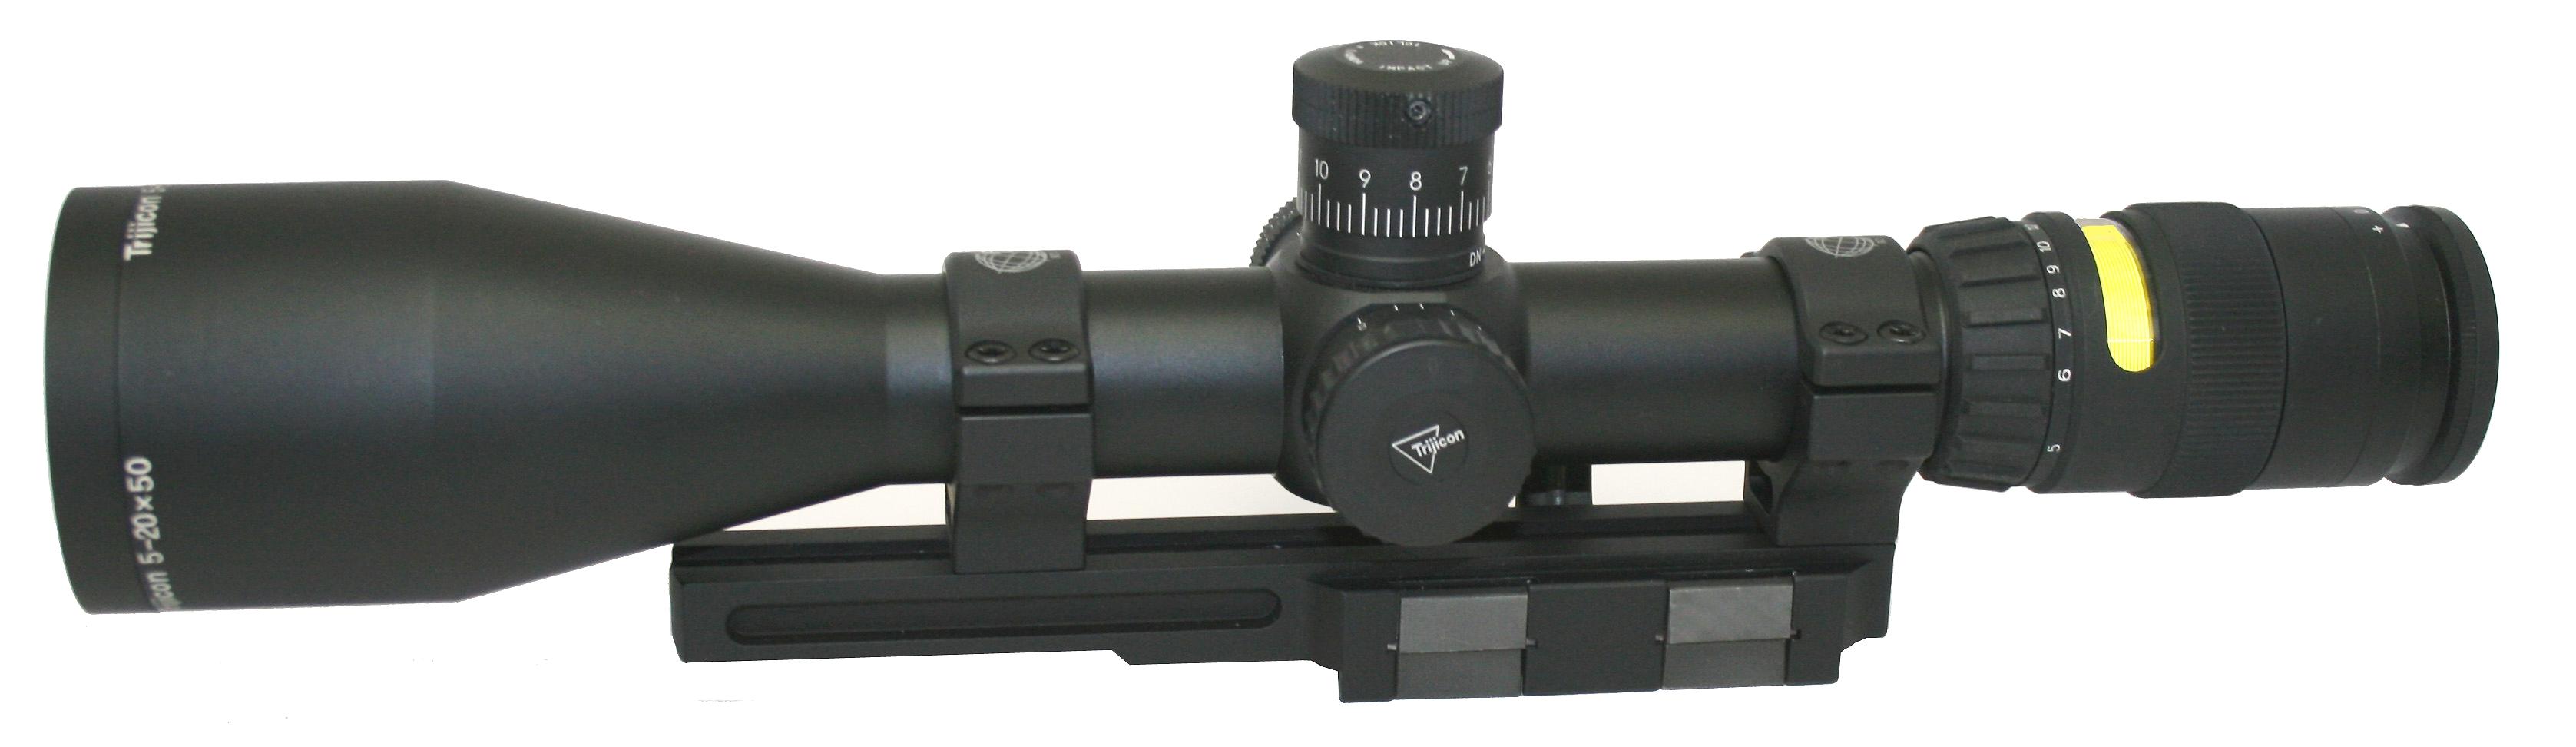 Precision Reflex PRI Mounts Gator Grip 3